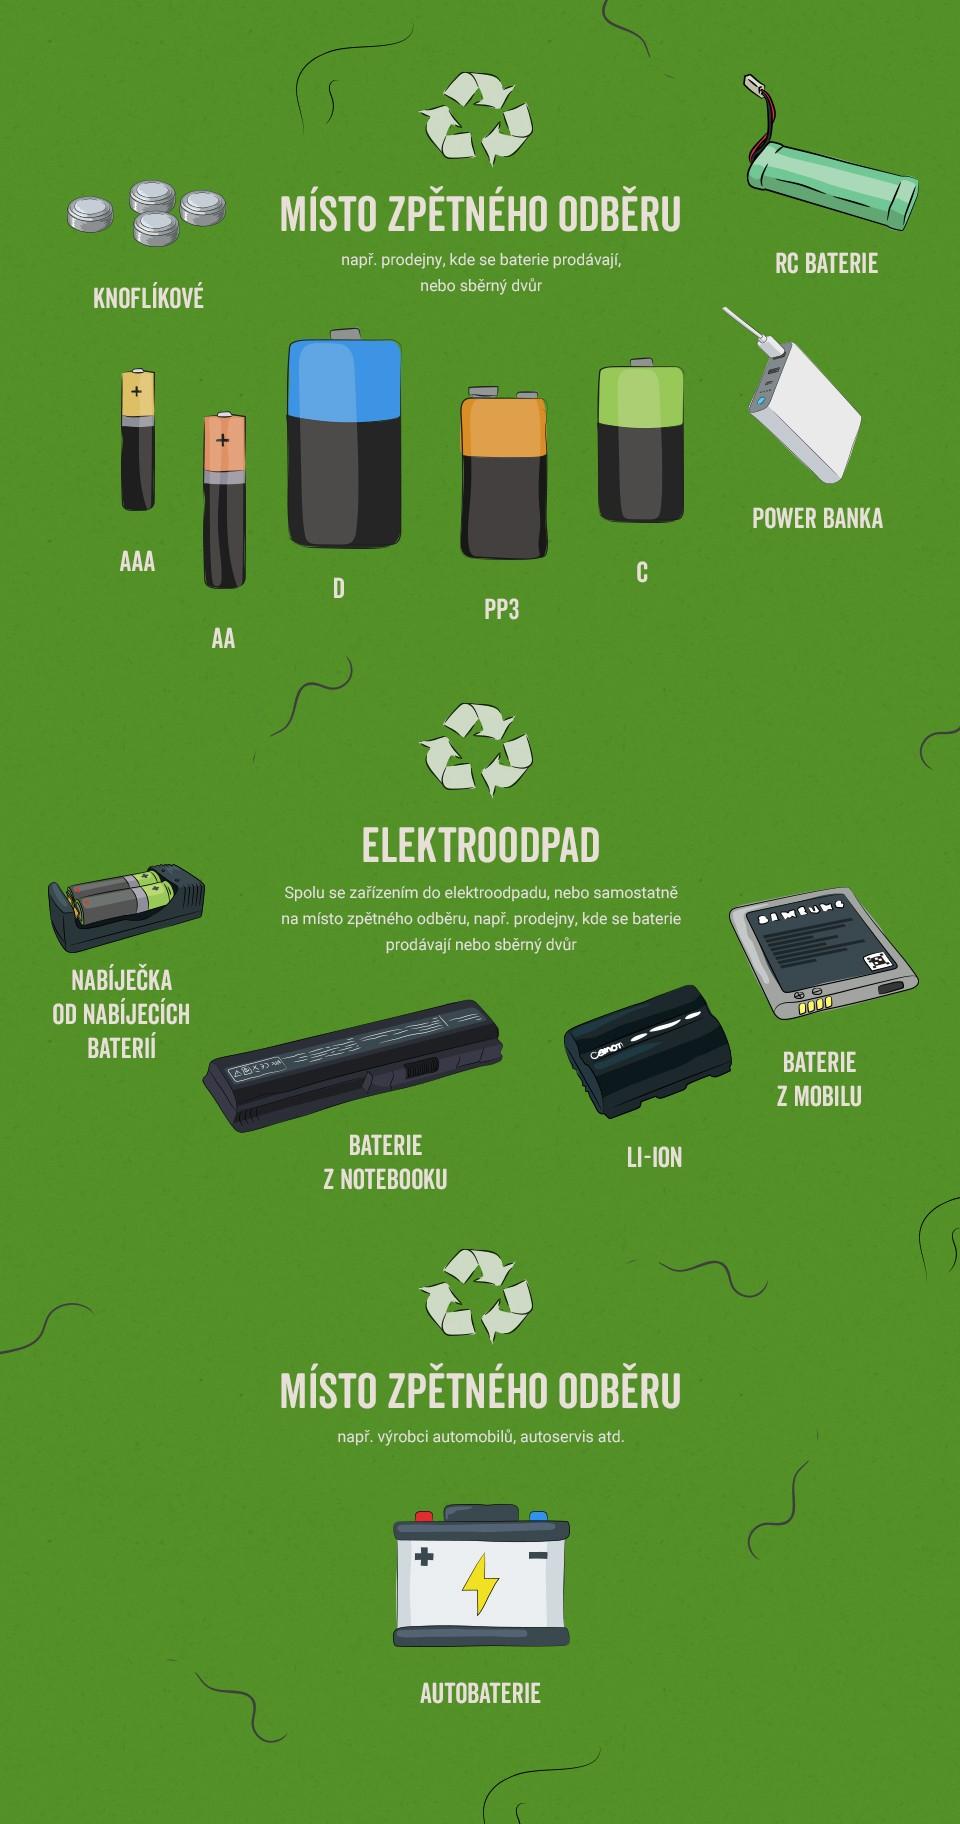 samosebou_infografika_baterie_baterka_trideni_odpad_samosebou_jak_tridit_power_banka